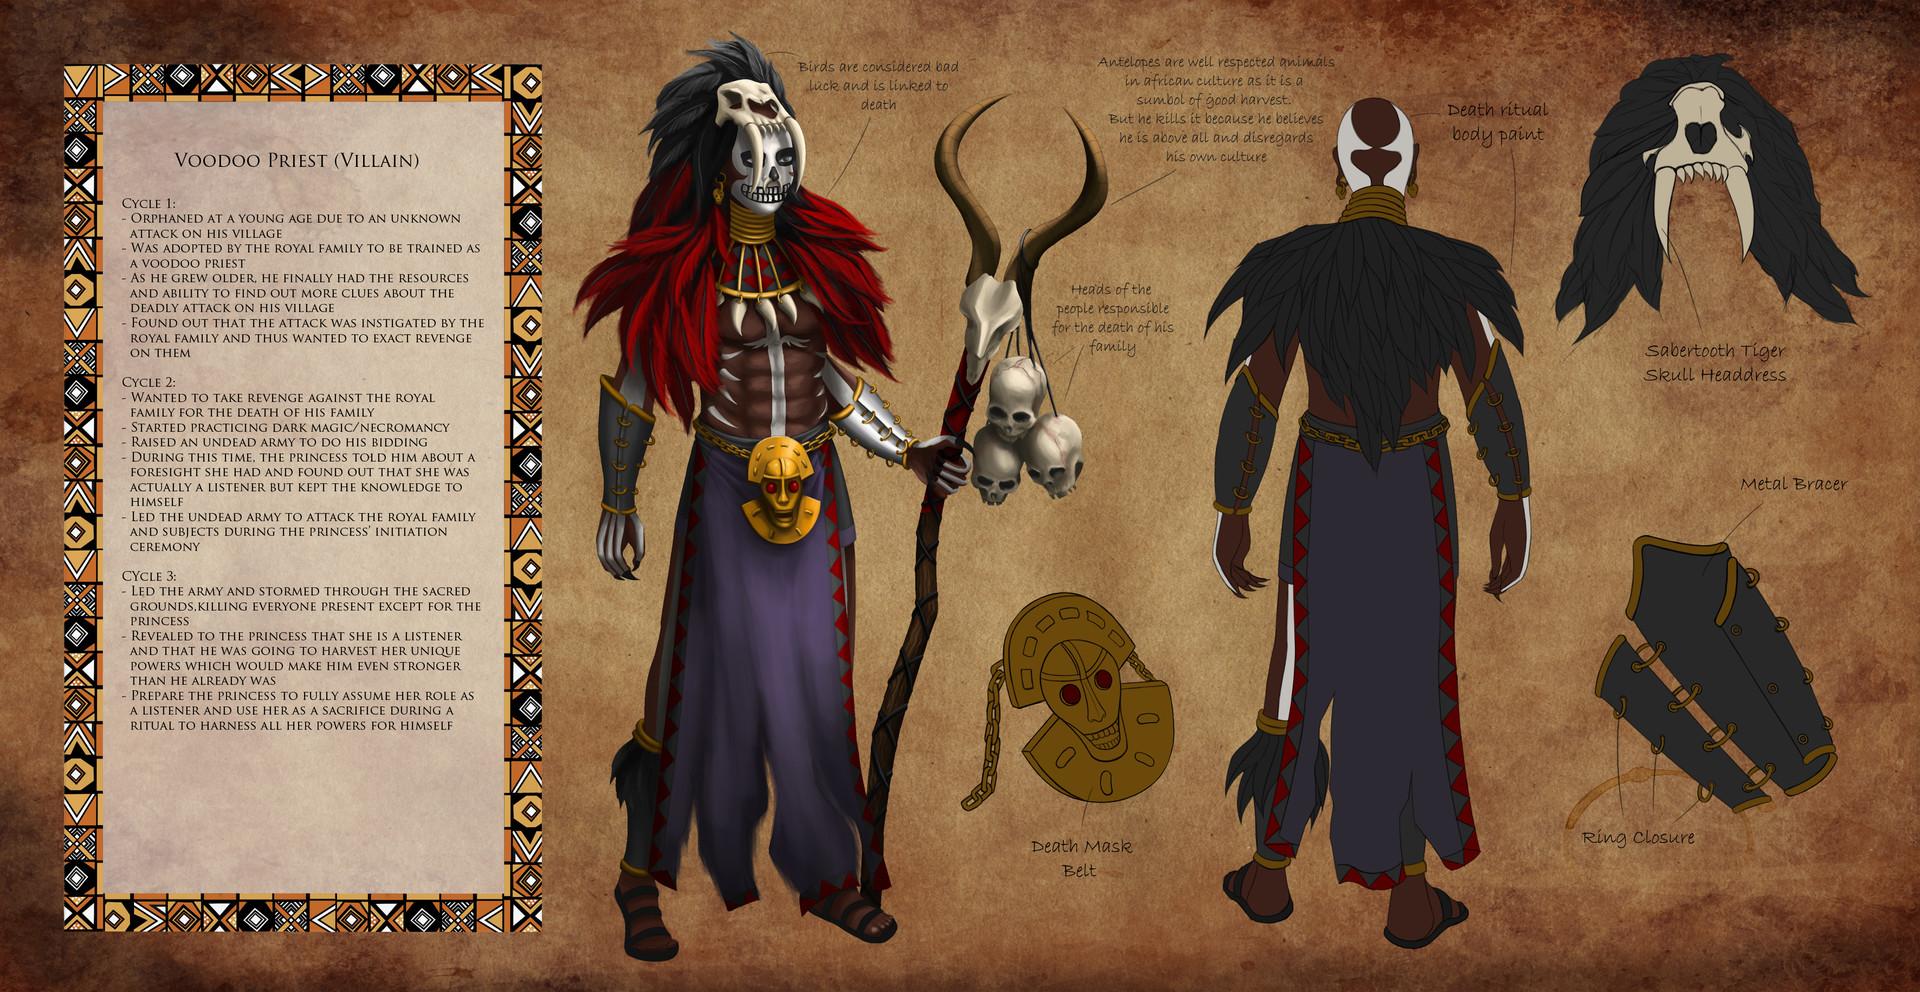 ArtStation - Voodoo priest voodoo concept, Sophia Eng